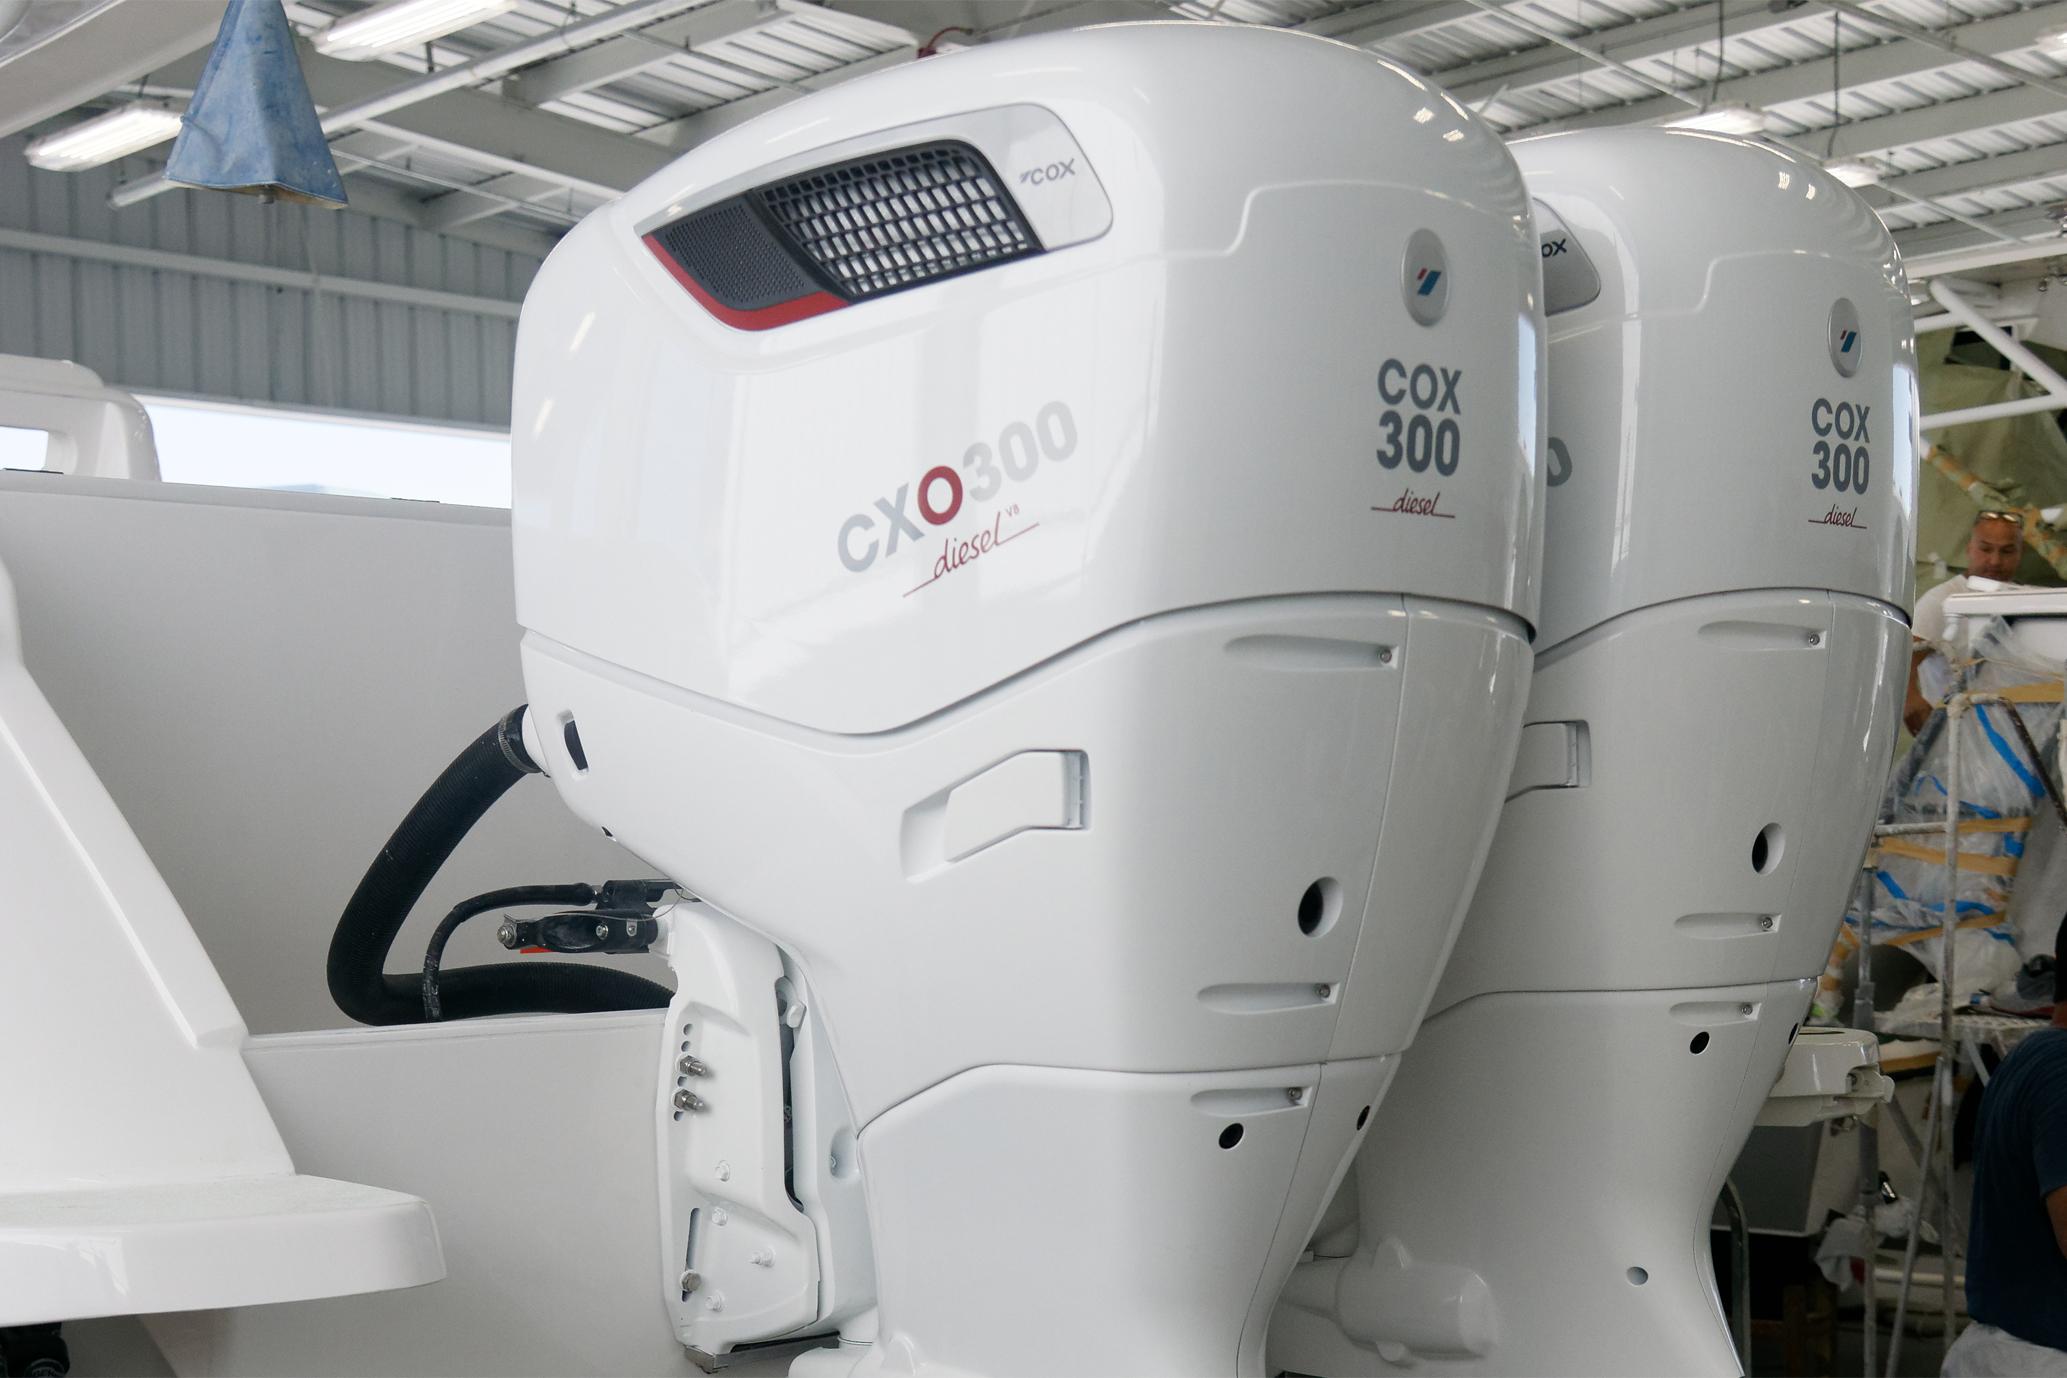 Cox Diesel Outboard Scoop - Cox Diesel Outboard Specifications